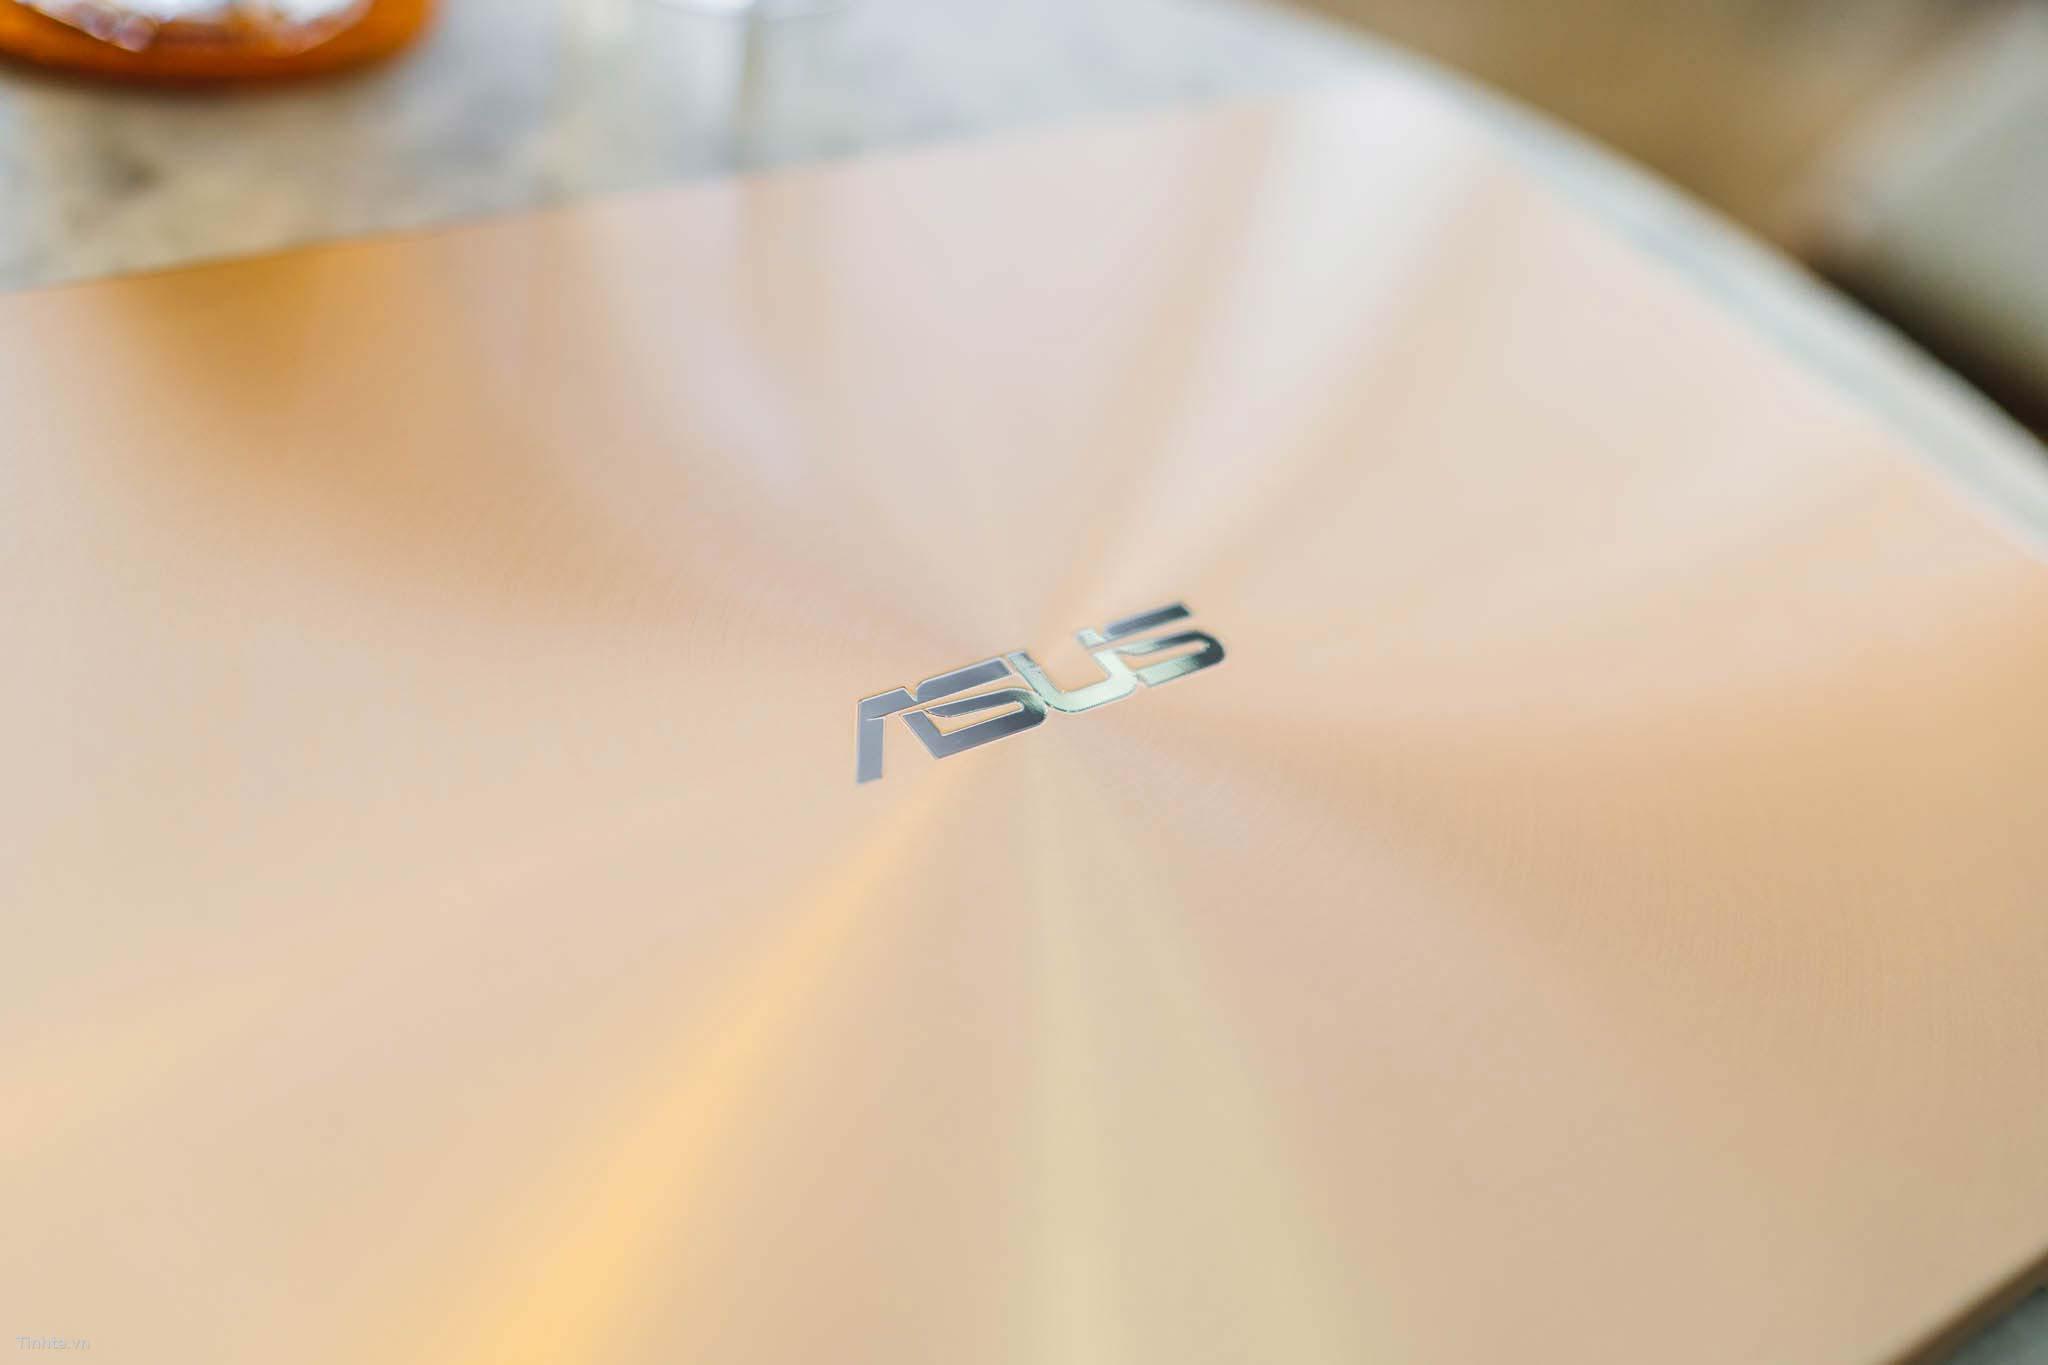 ASUS_UX430_ex-2.jpg